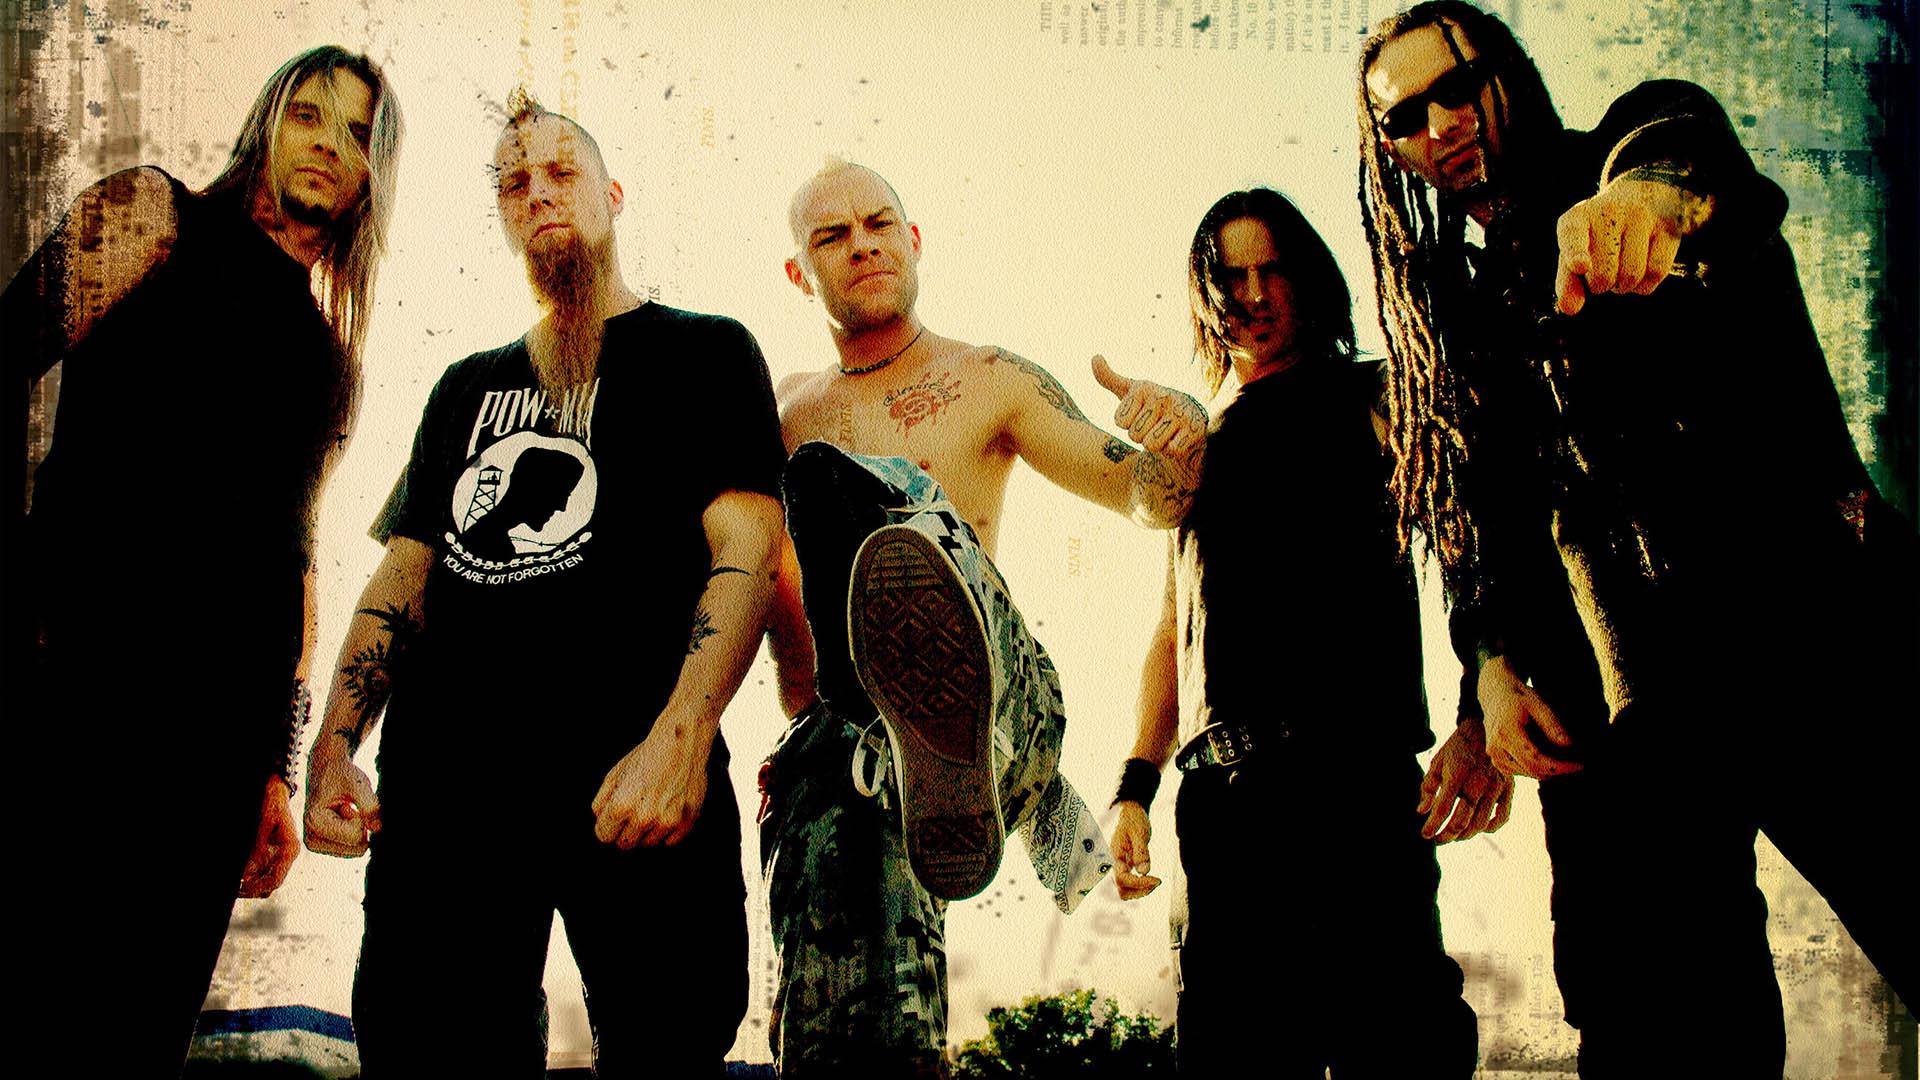 FIVE-FINGER-DEATH-PUNCH-heavy-metal-hard-rock-bands-e-wallpaper-wp3405580